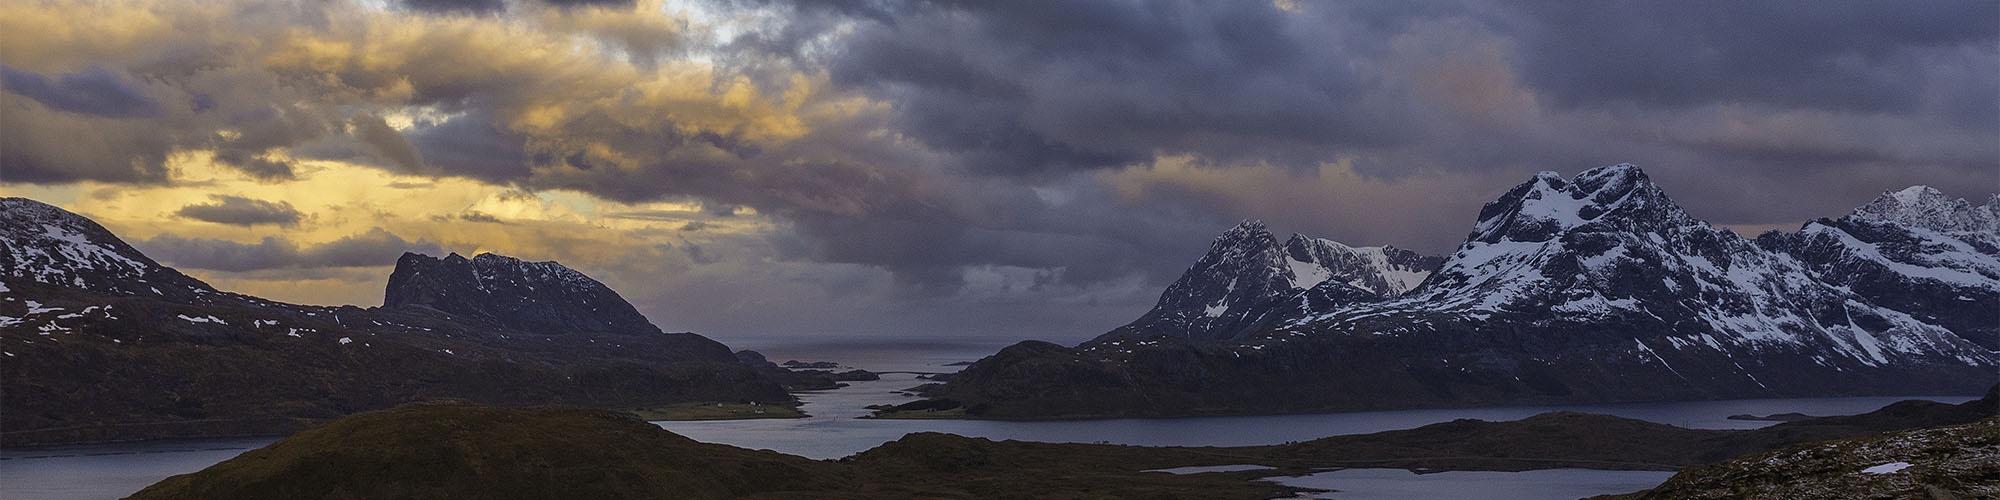 Lofoten Islands - - A Visual Expedition -